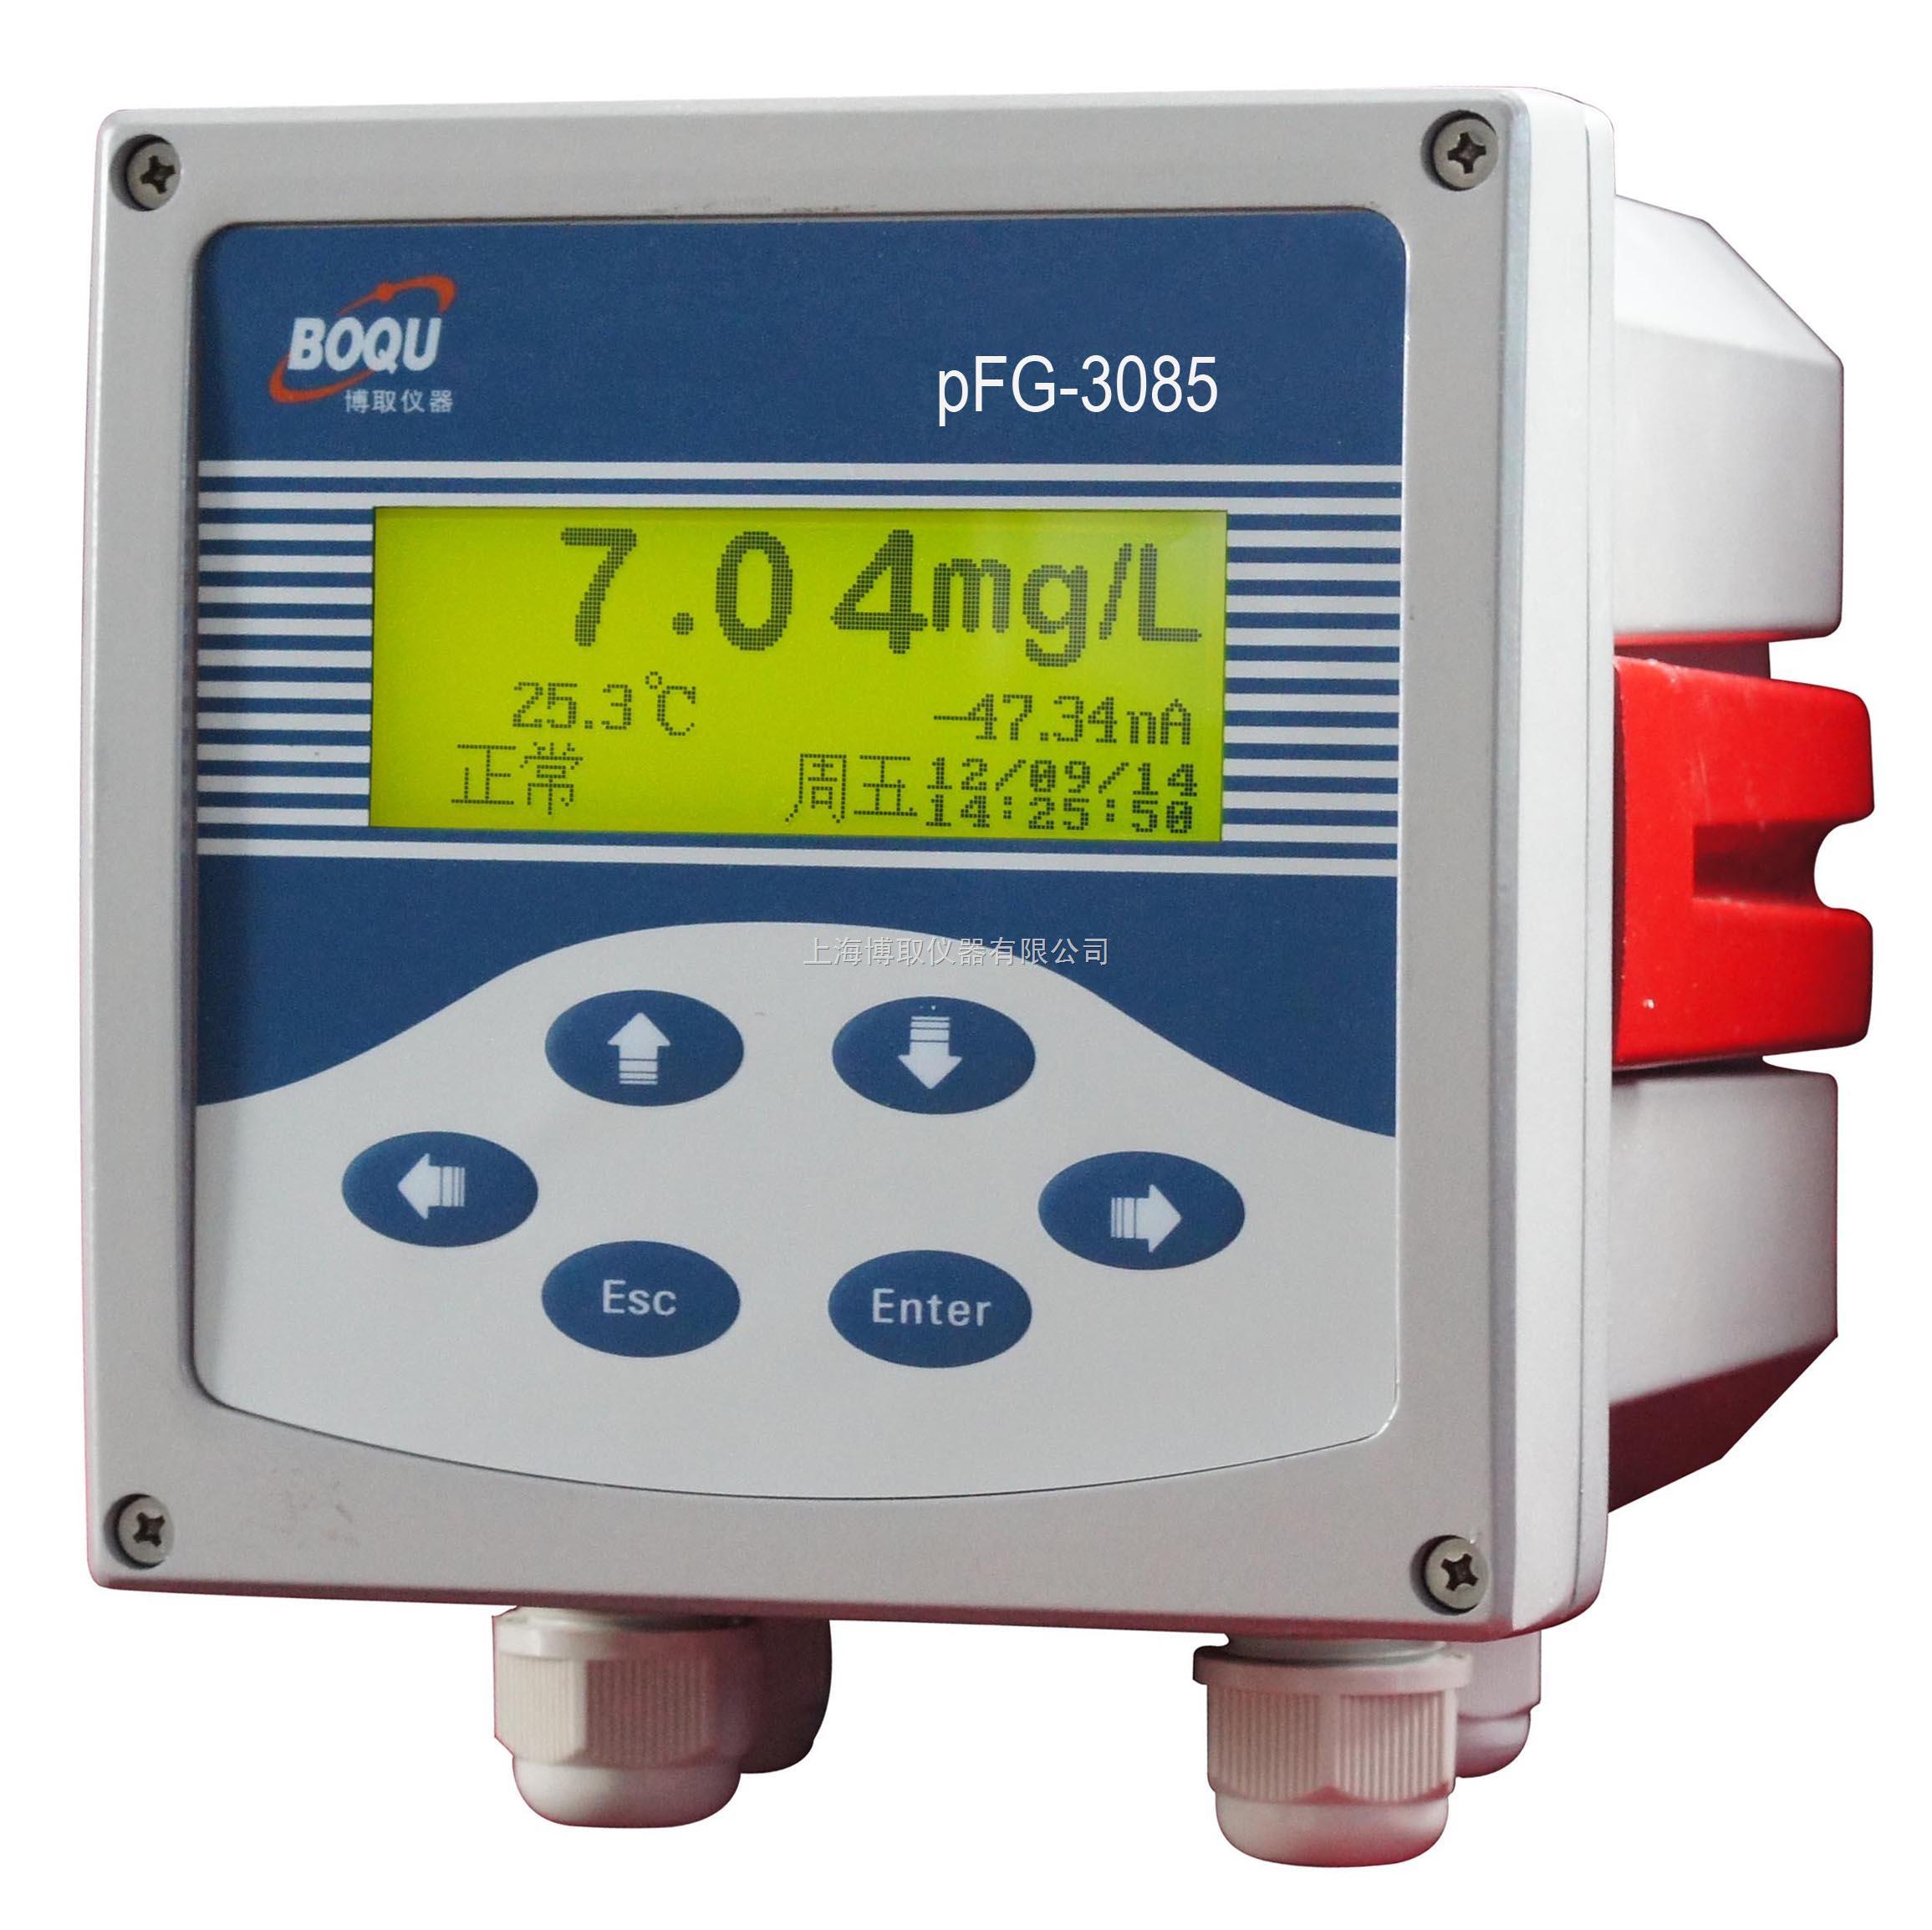 PFG-3085工业在线氟离子检测仪(铸铝壳体)